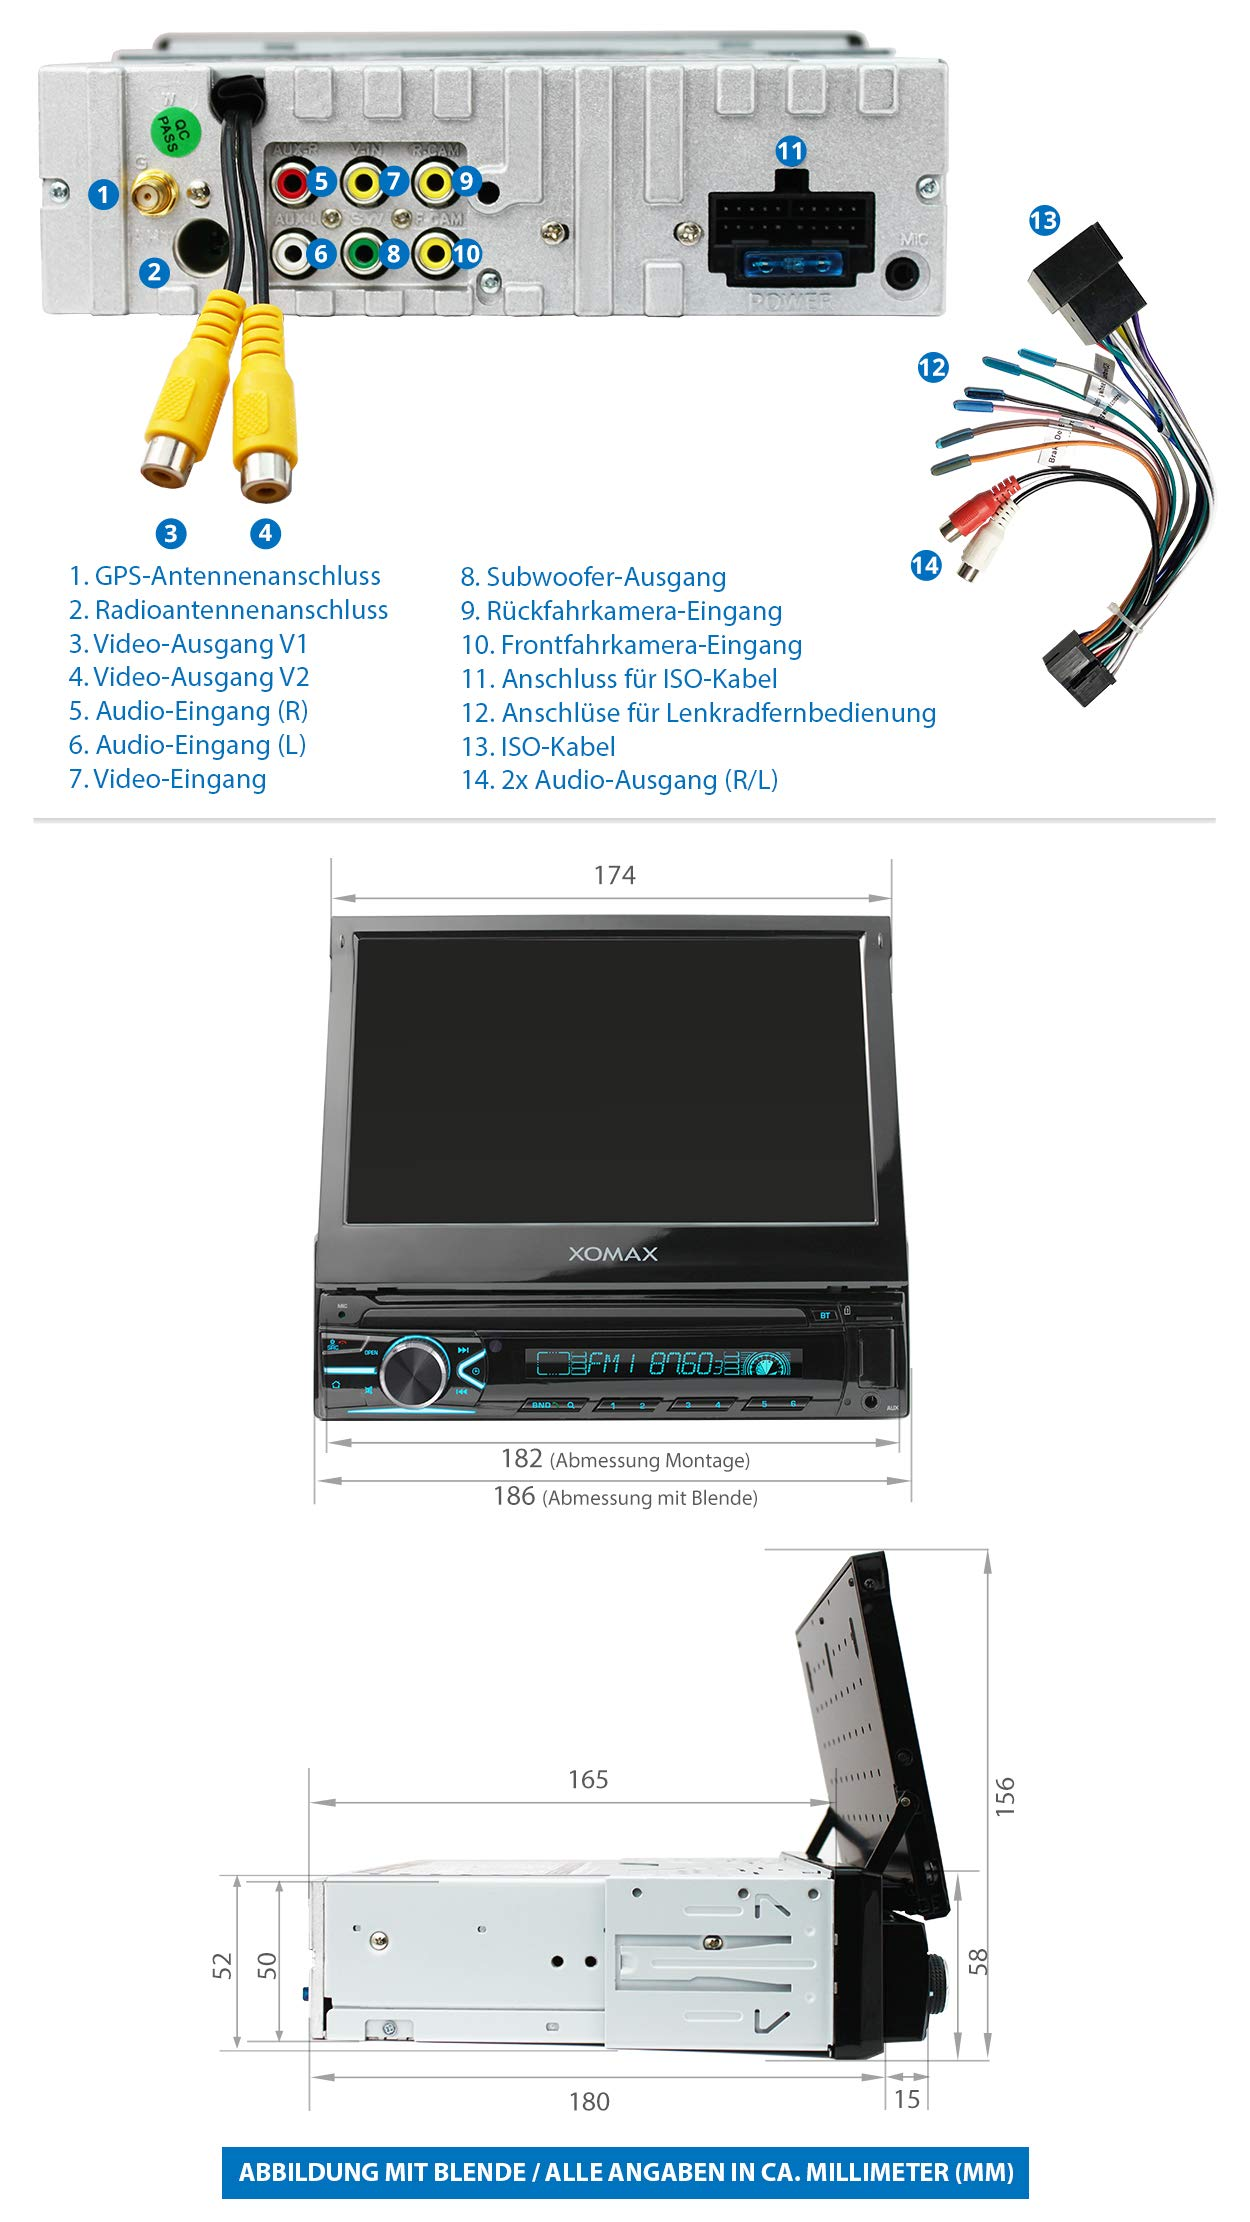 XOMAX-XM-VN745-Autoradio-mit-Mirrorlink-I-GPS-Navigation-I-Bluetooth-I-7-18-cm-Touchscreen-Bildschirm-I-RDS-USB-AUX-I-Anschlsse-fr-Rckfahrkamera-und-Lenkradfernbedienung-I-1-DIN